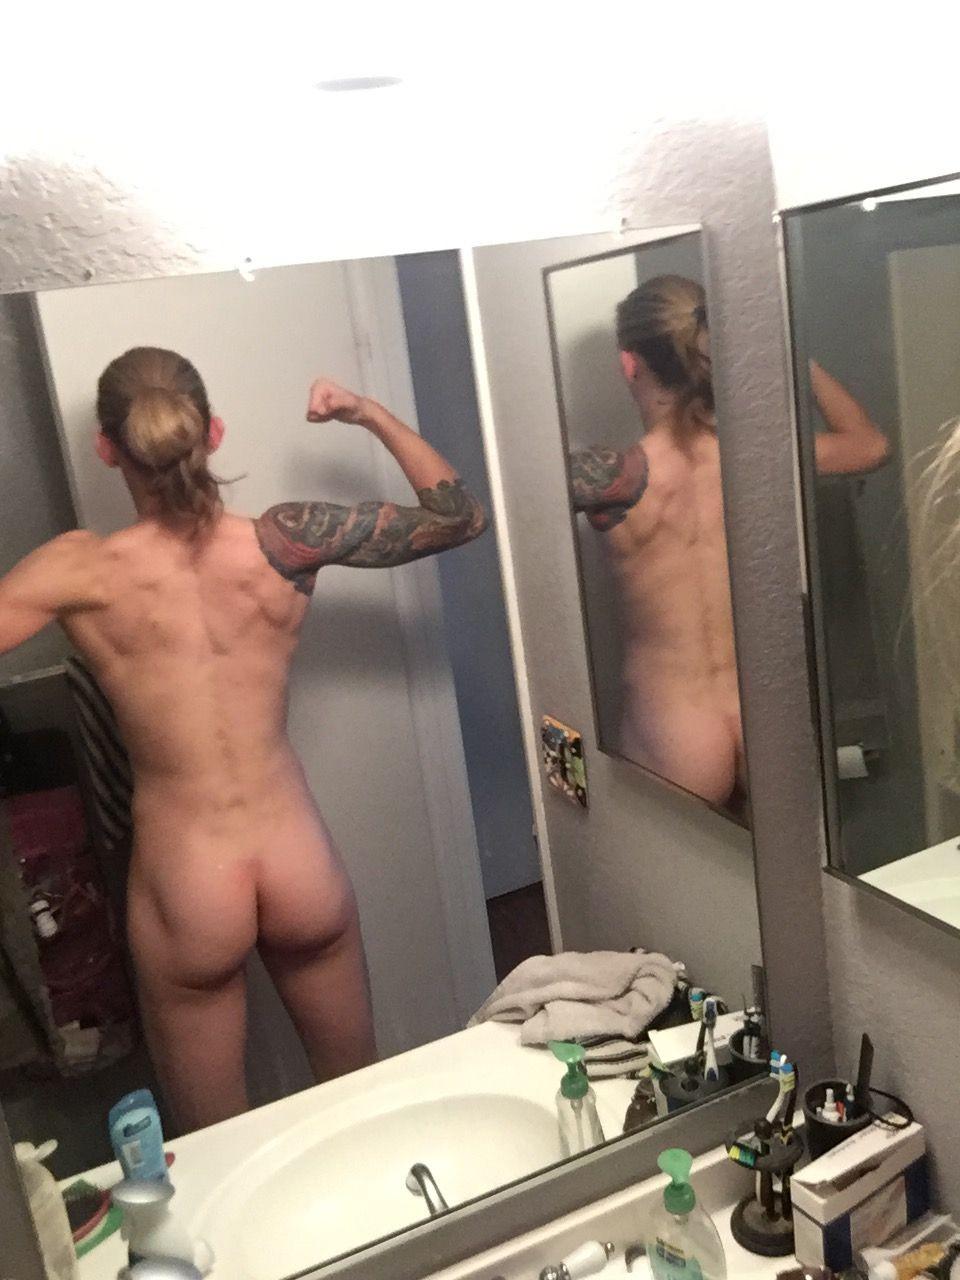 Amateur videos of men jerking off